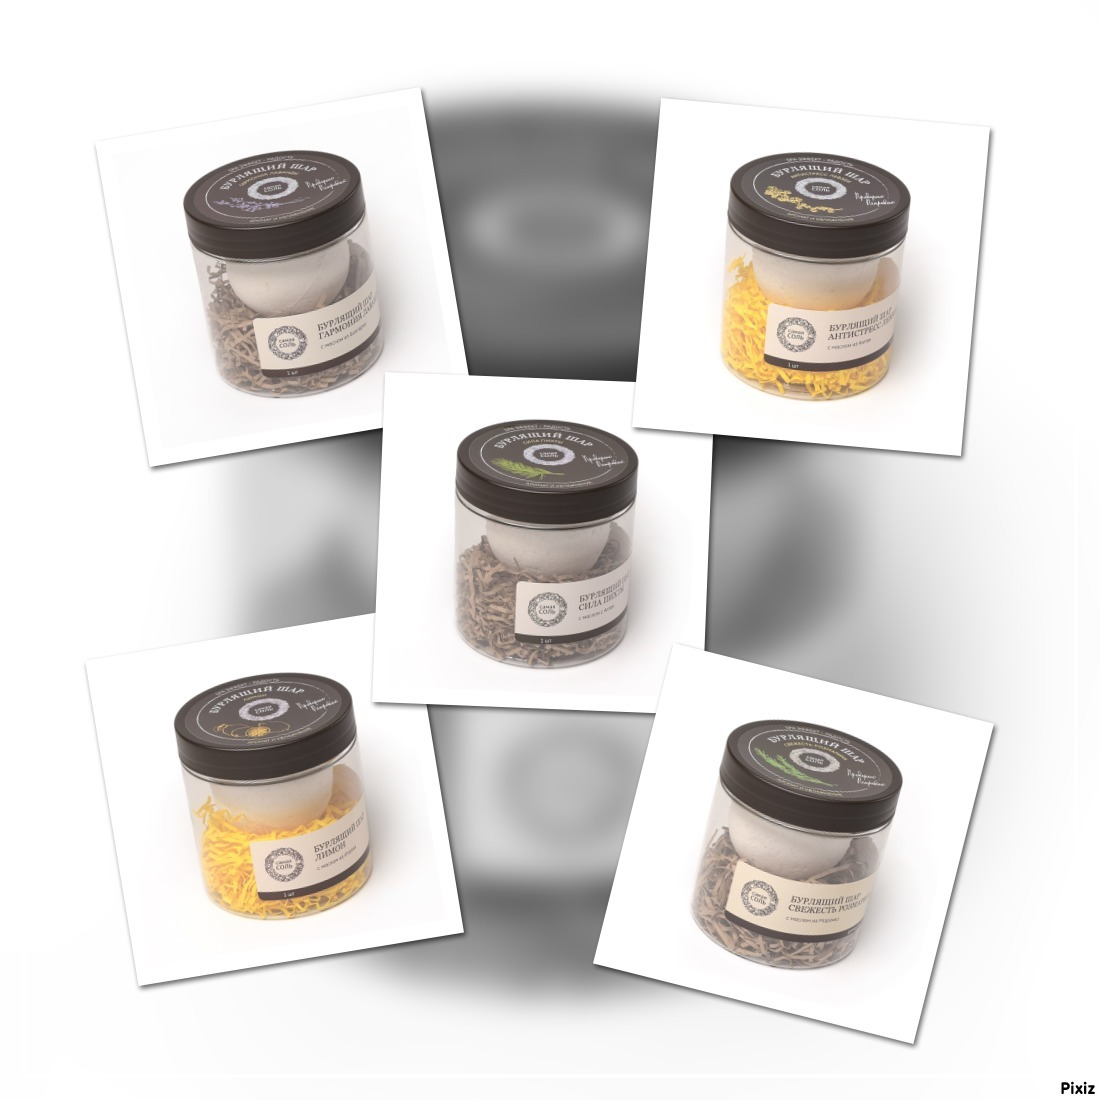 Набор бурлящих шаров 5 видов: Лаванда, Пихта, Розмарин, Лимон, Левзея